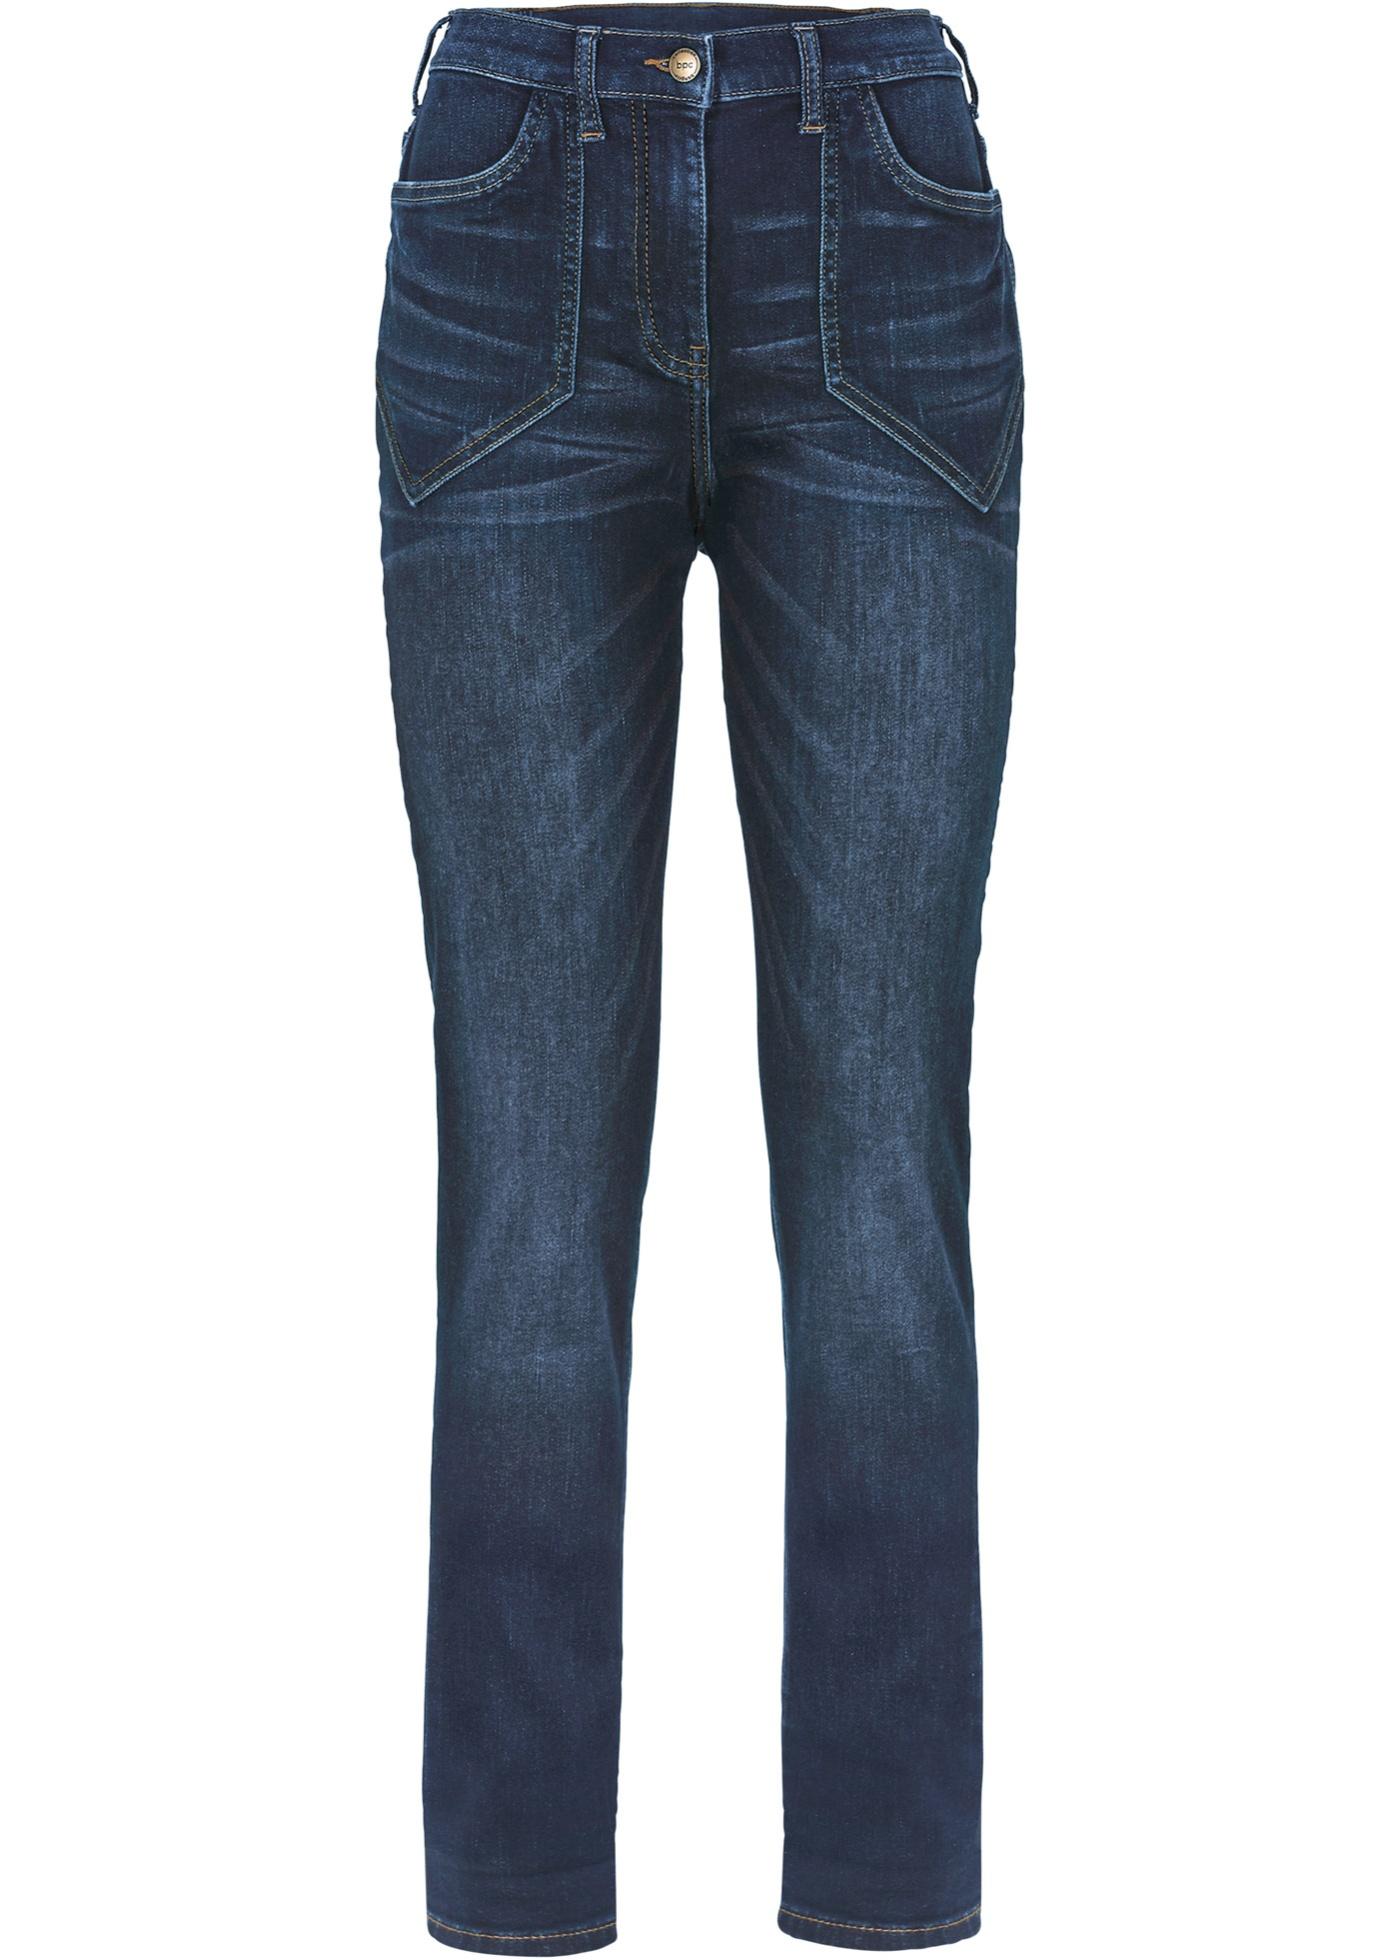 Bpc Waist High In Dames Jeans Collection Stretch Zwart Bonprix thsdQrC